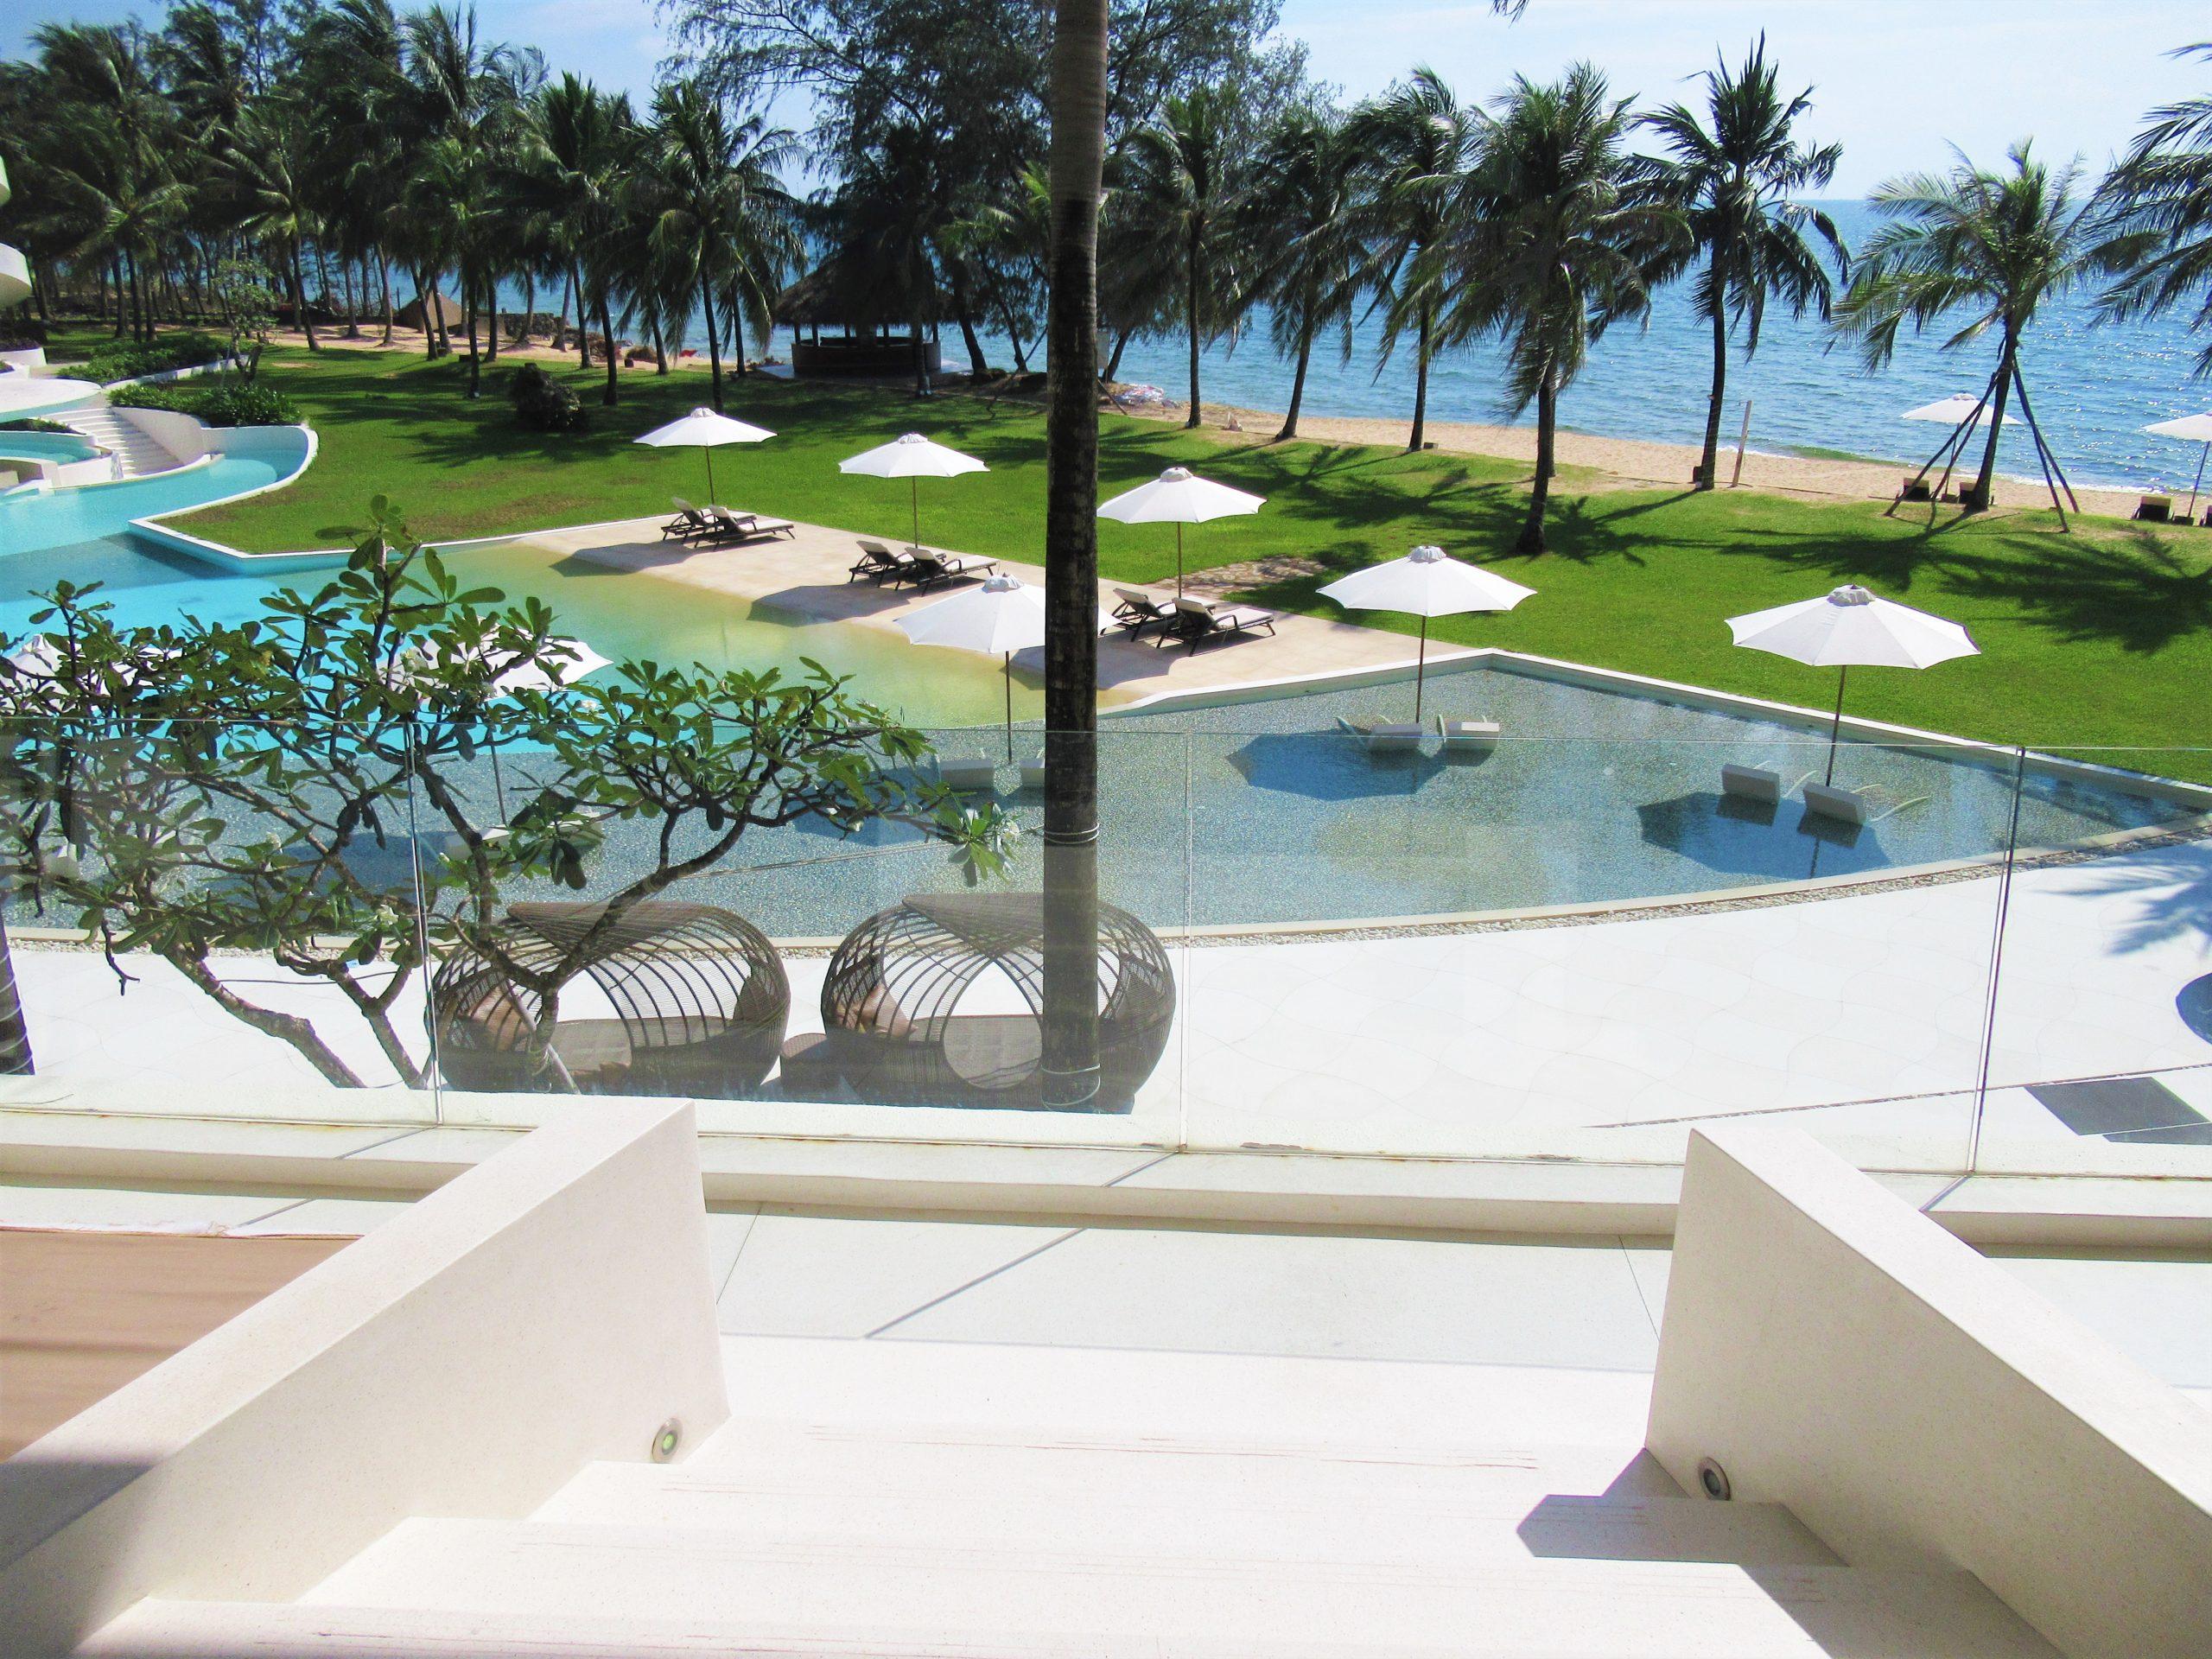 Balcony of guest room, The Shells Resort, Phu Quoc Island, Vietnam